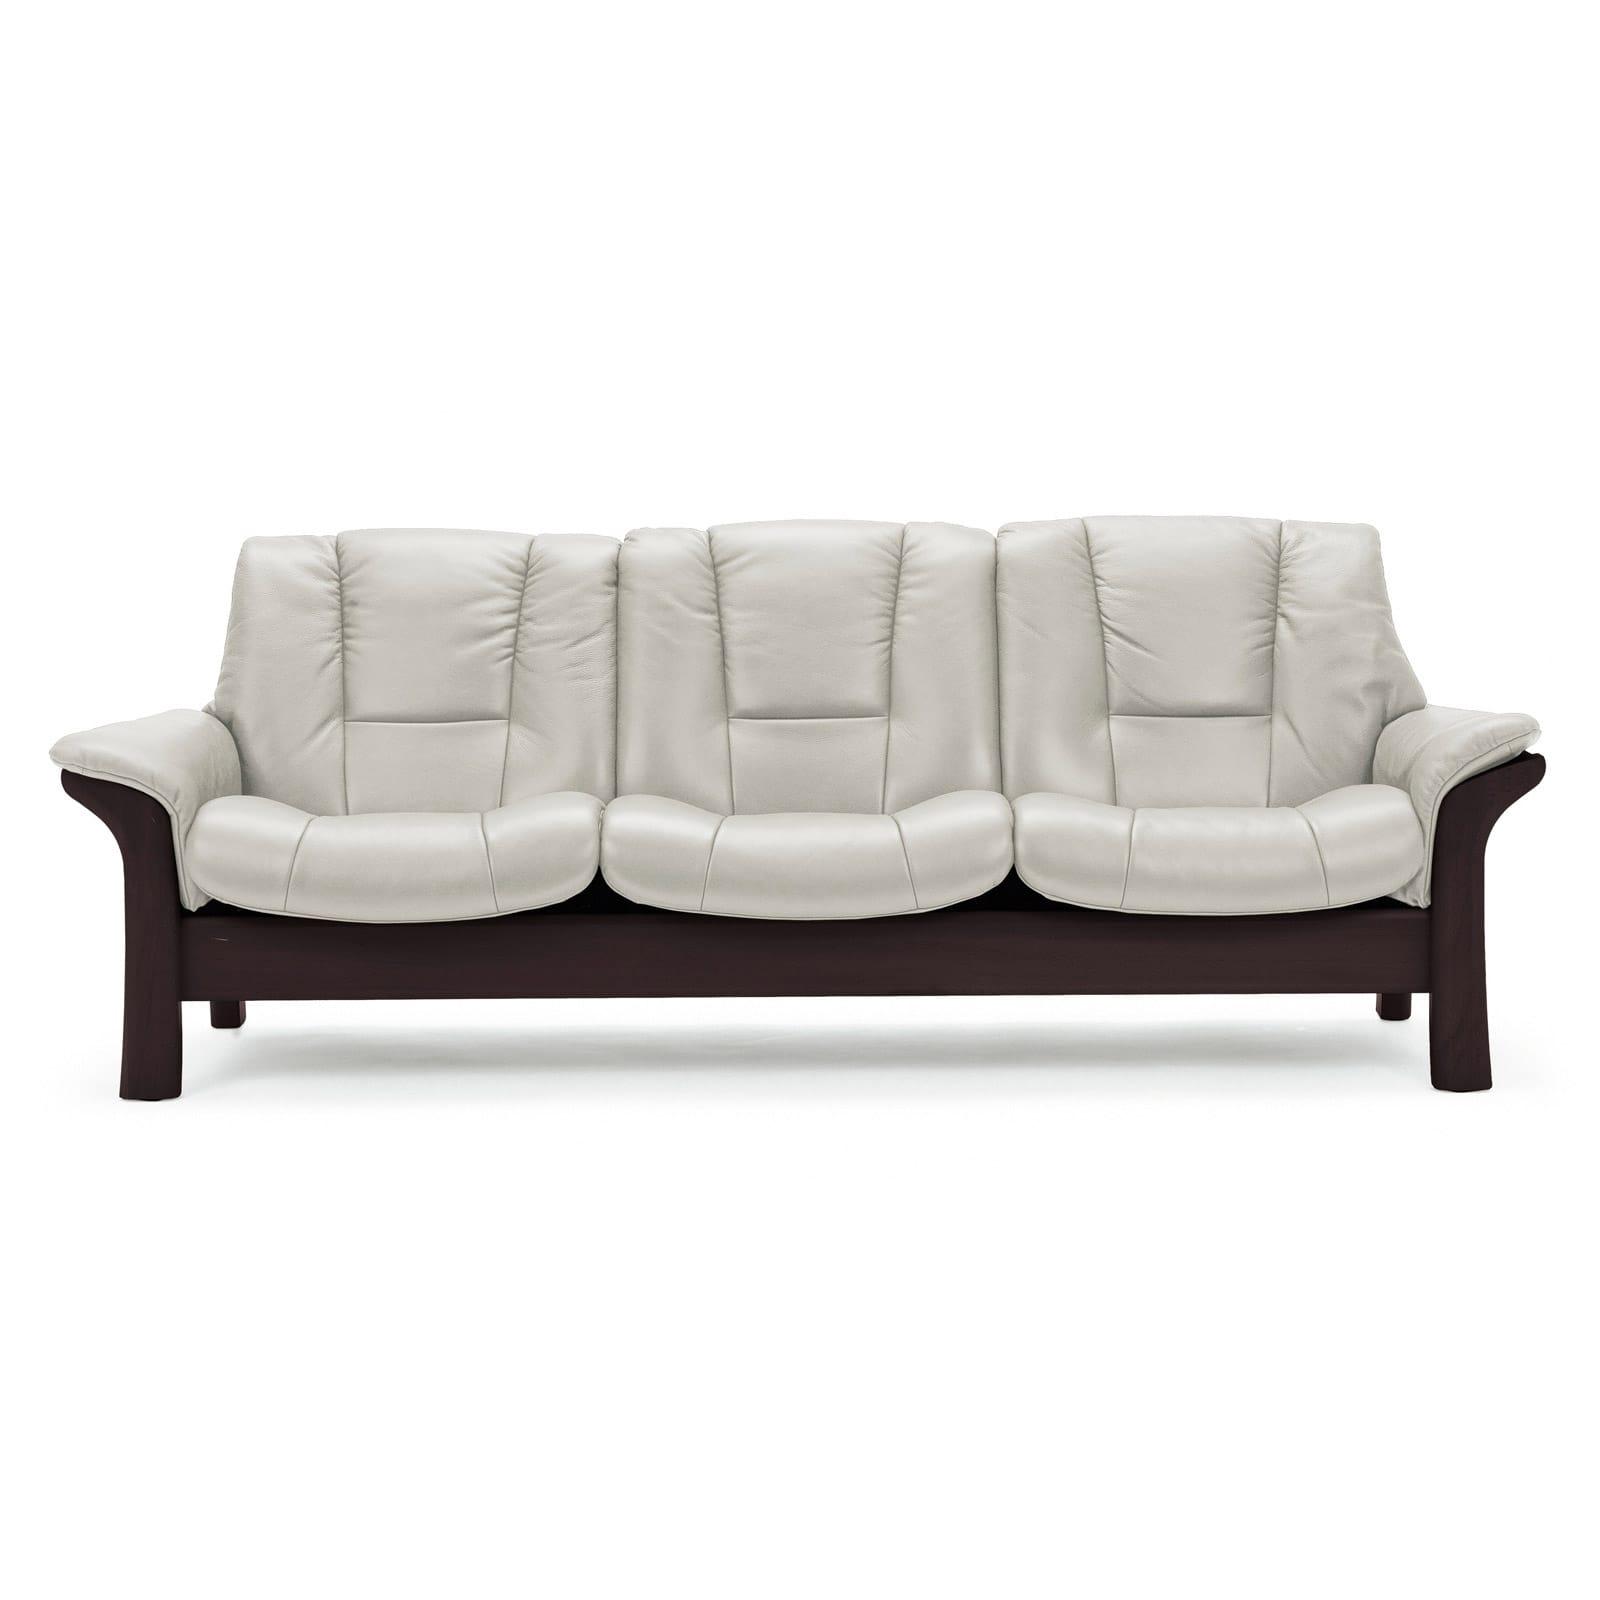 stressless sofa 3 sitzer buckingham l niedrig paloma. Black Bedroom Furniture Sets. Home Design Ideas